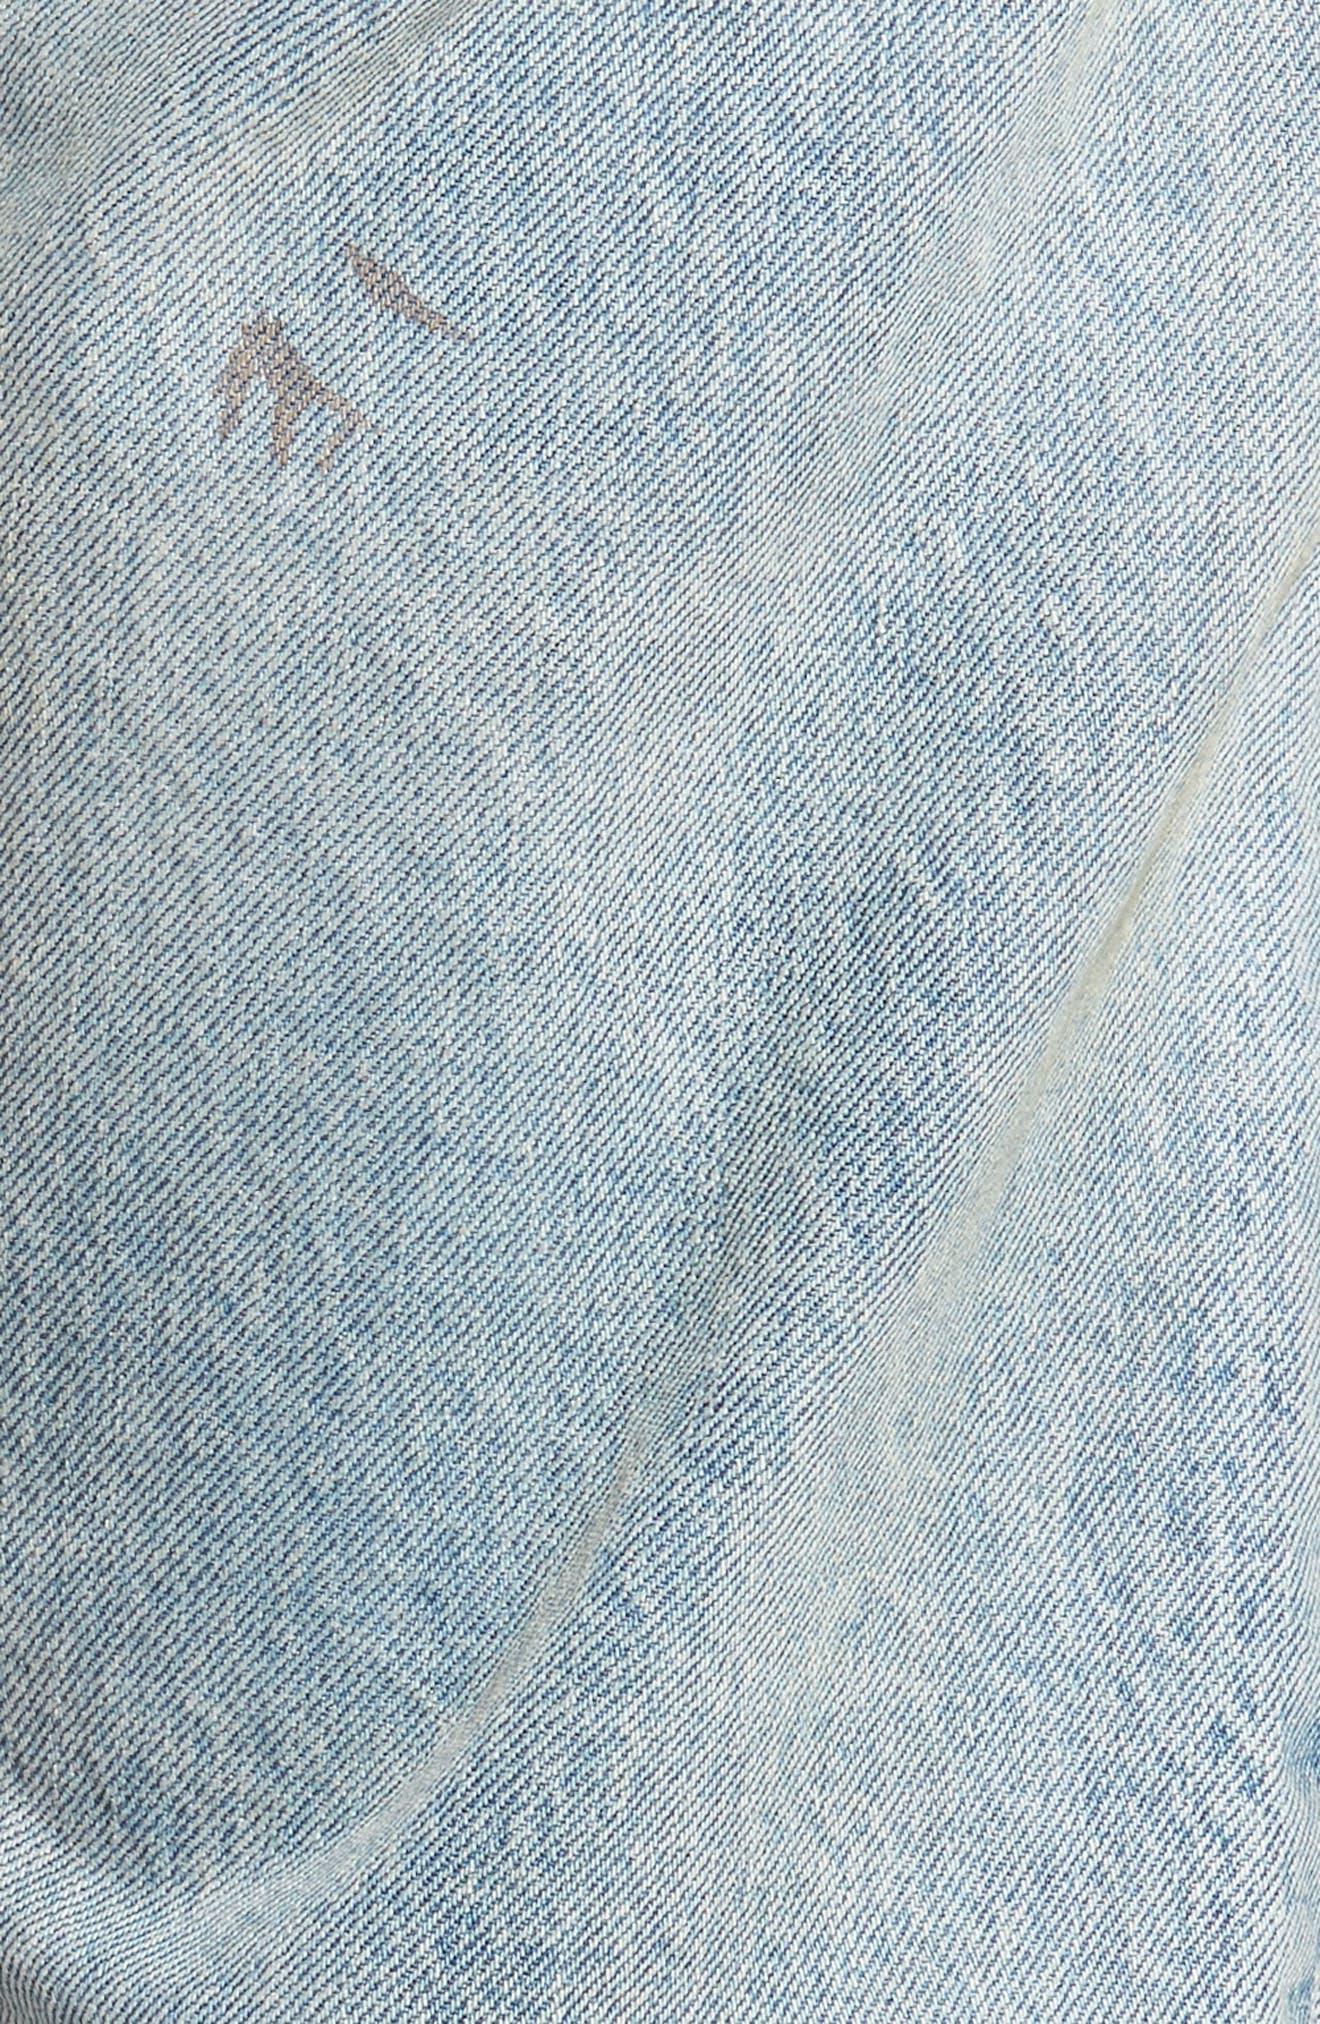 Alternate Image 5  - Levi's® 512 Slouchy Skinny Fit Jeans (Taku Warp)